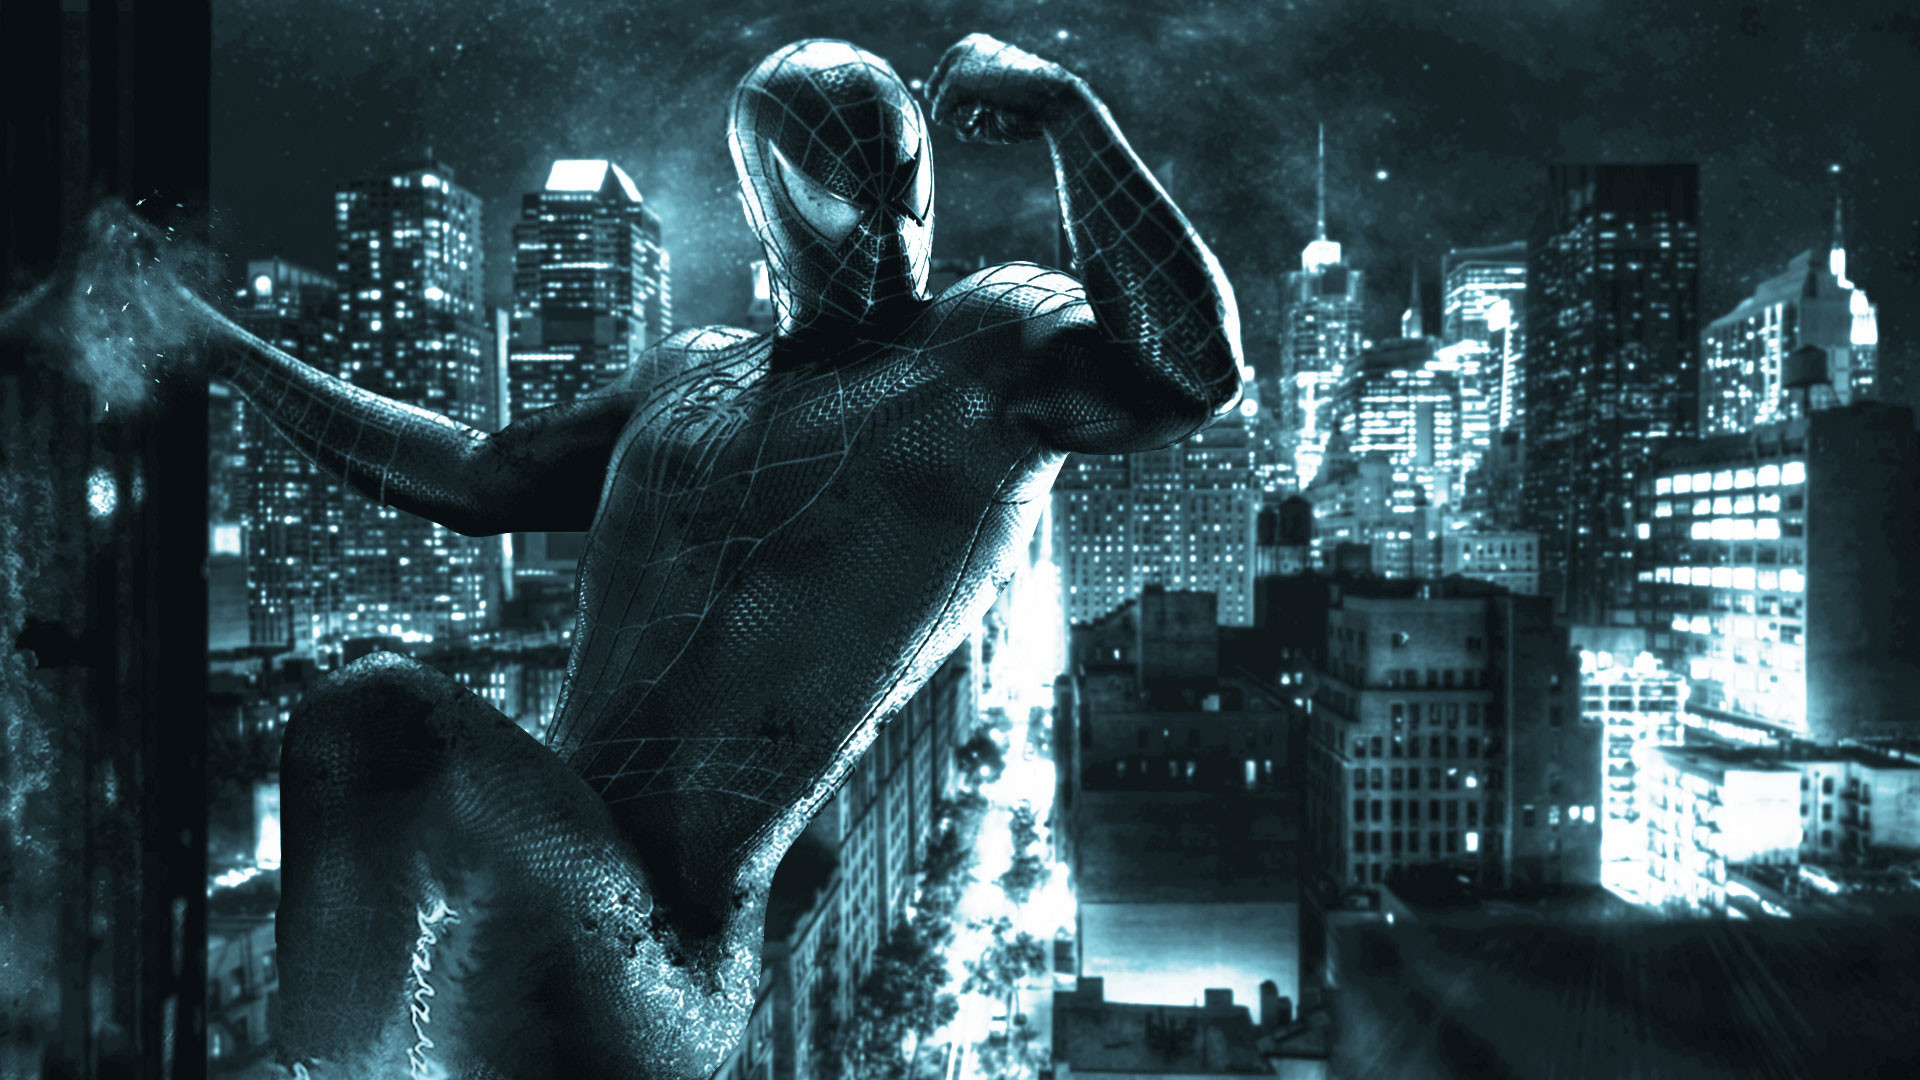 Black Spiderman Iphone HD Wallpapers.